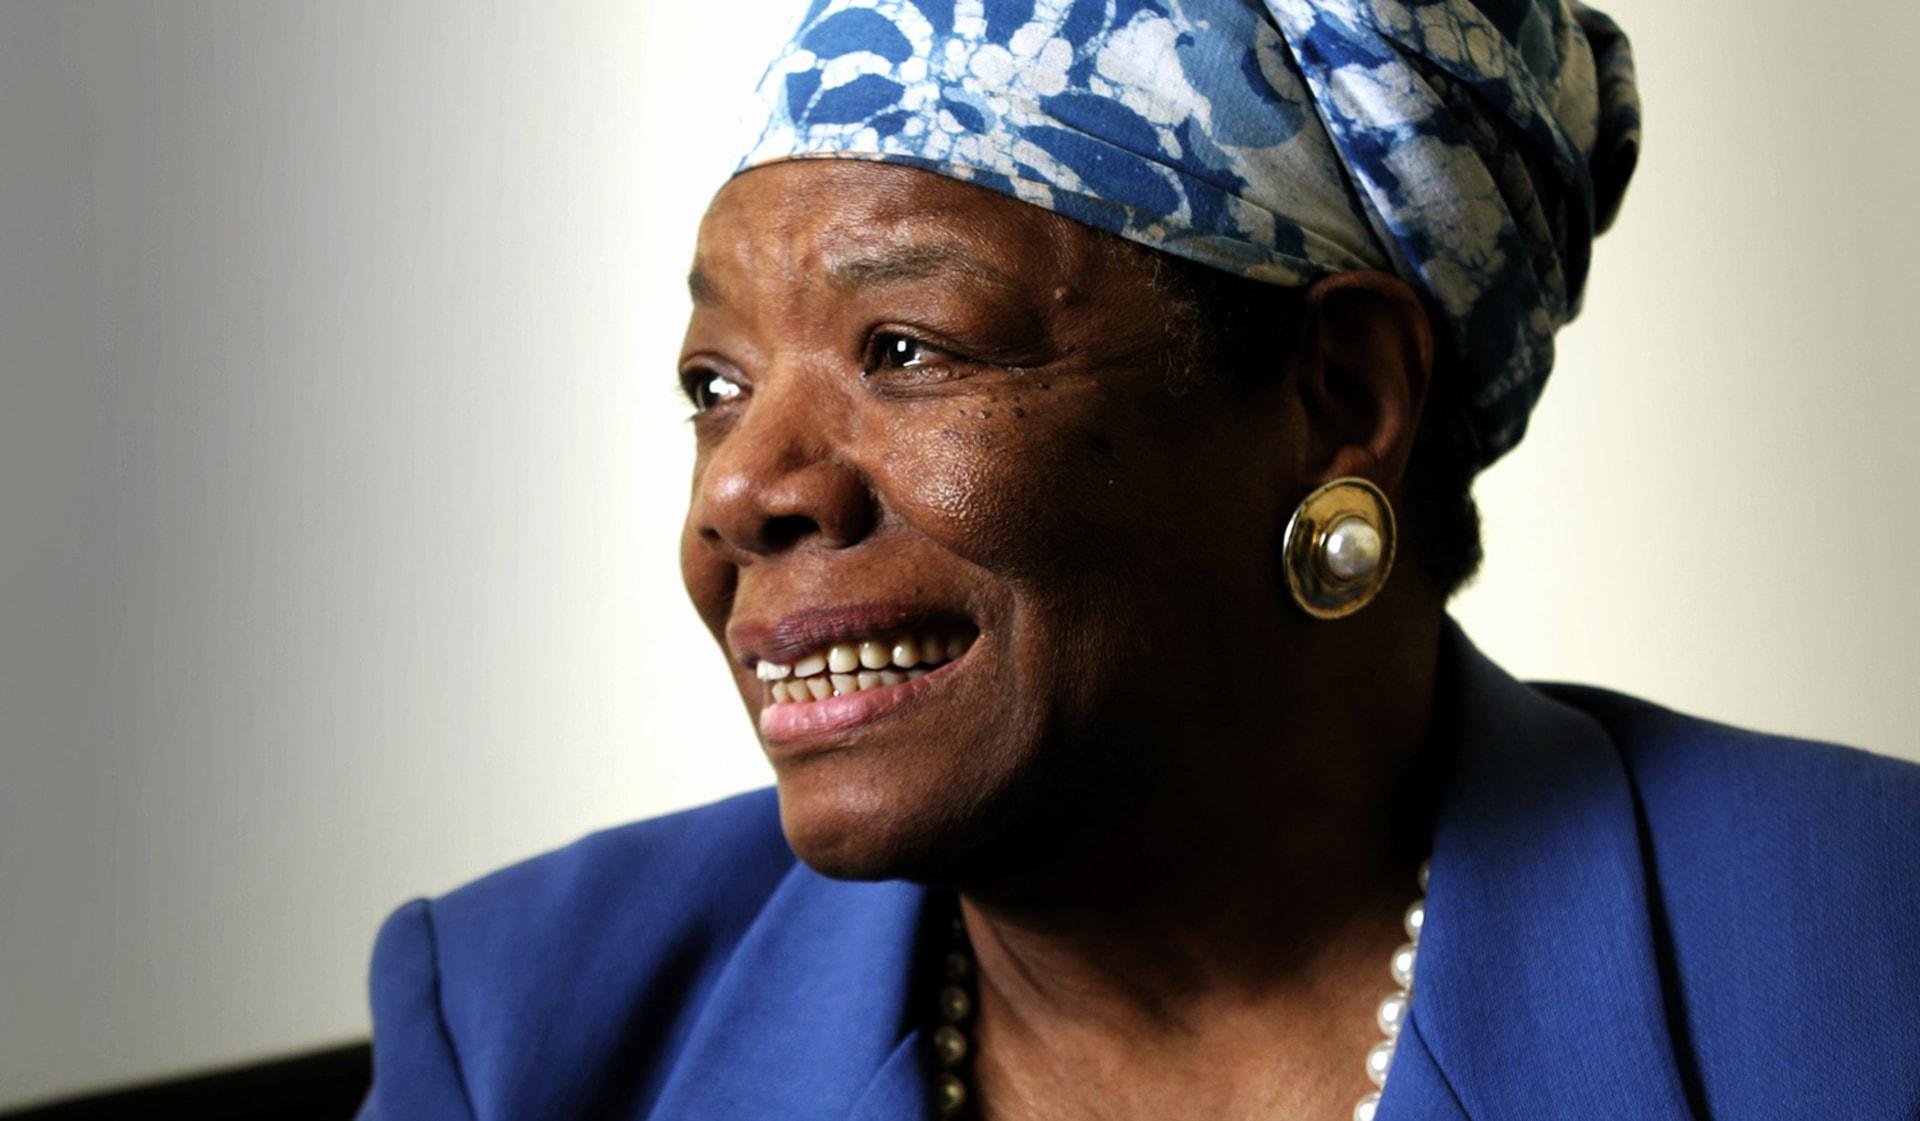 Image: Dr Maya Angelou